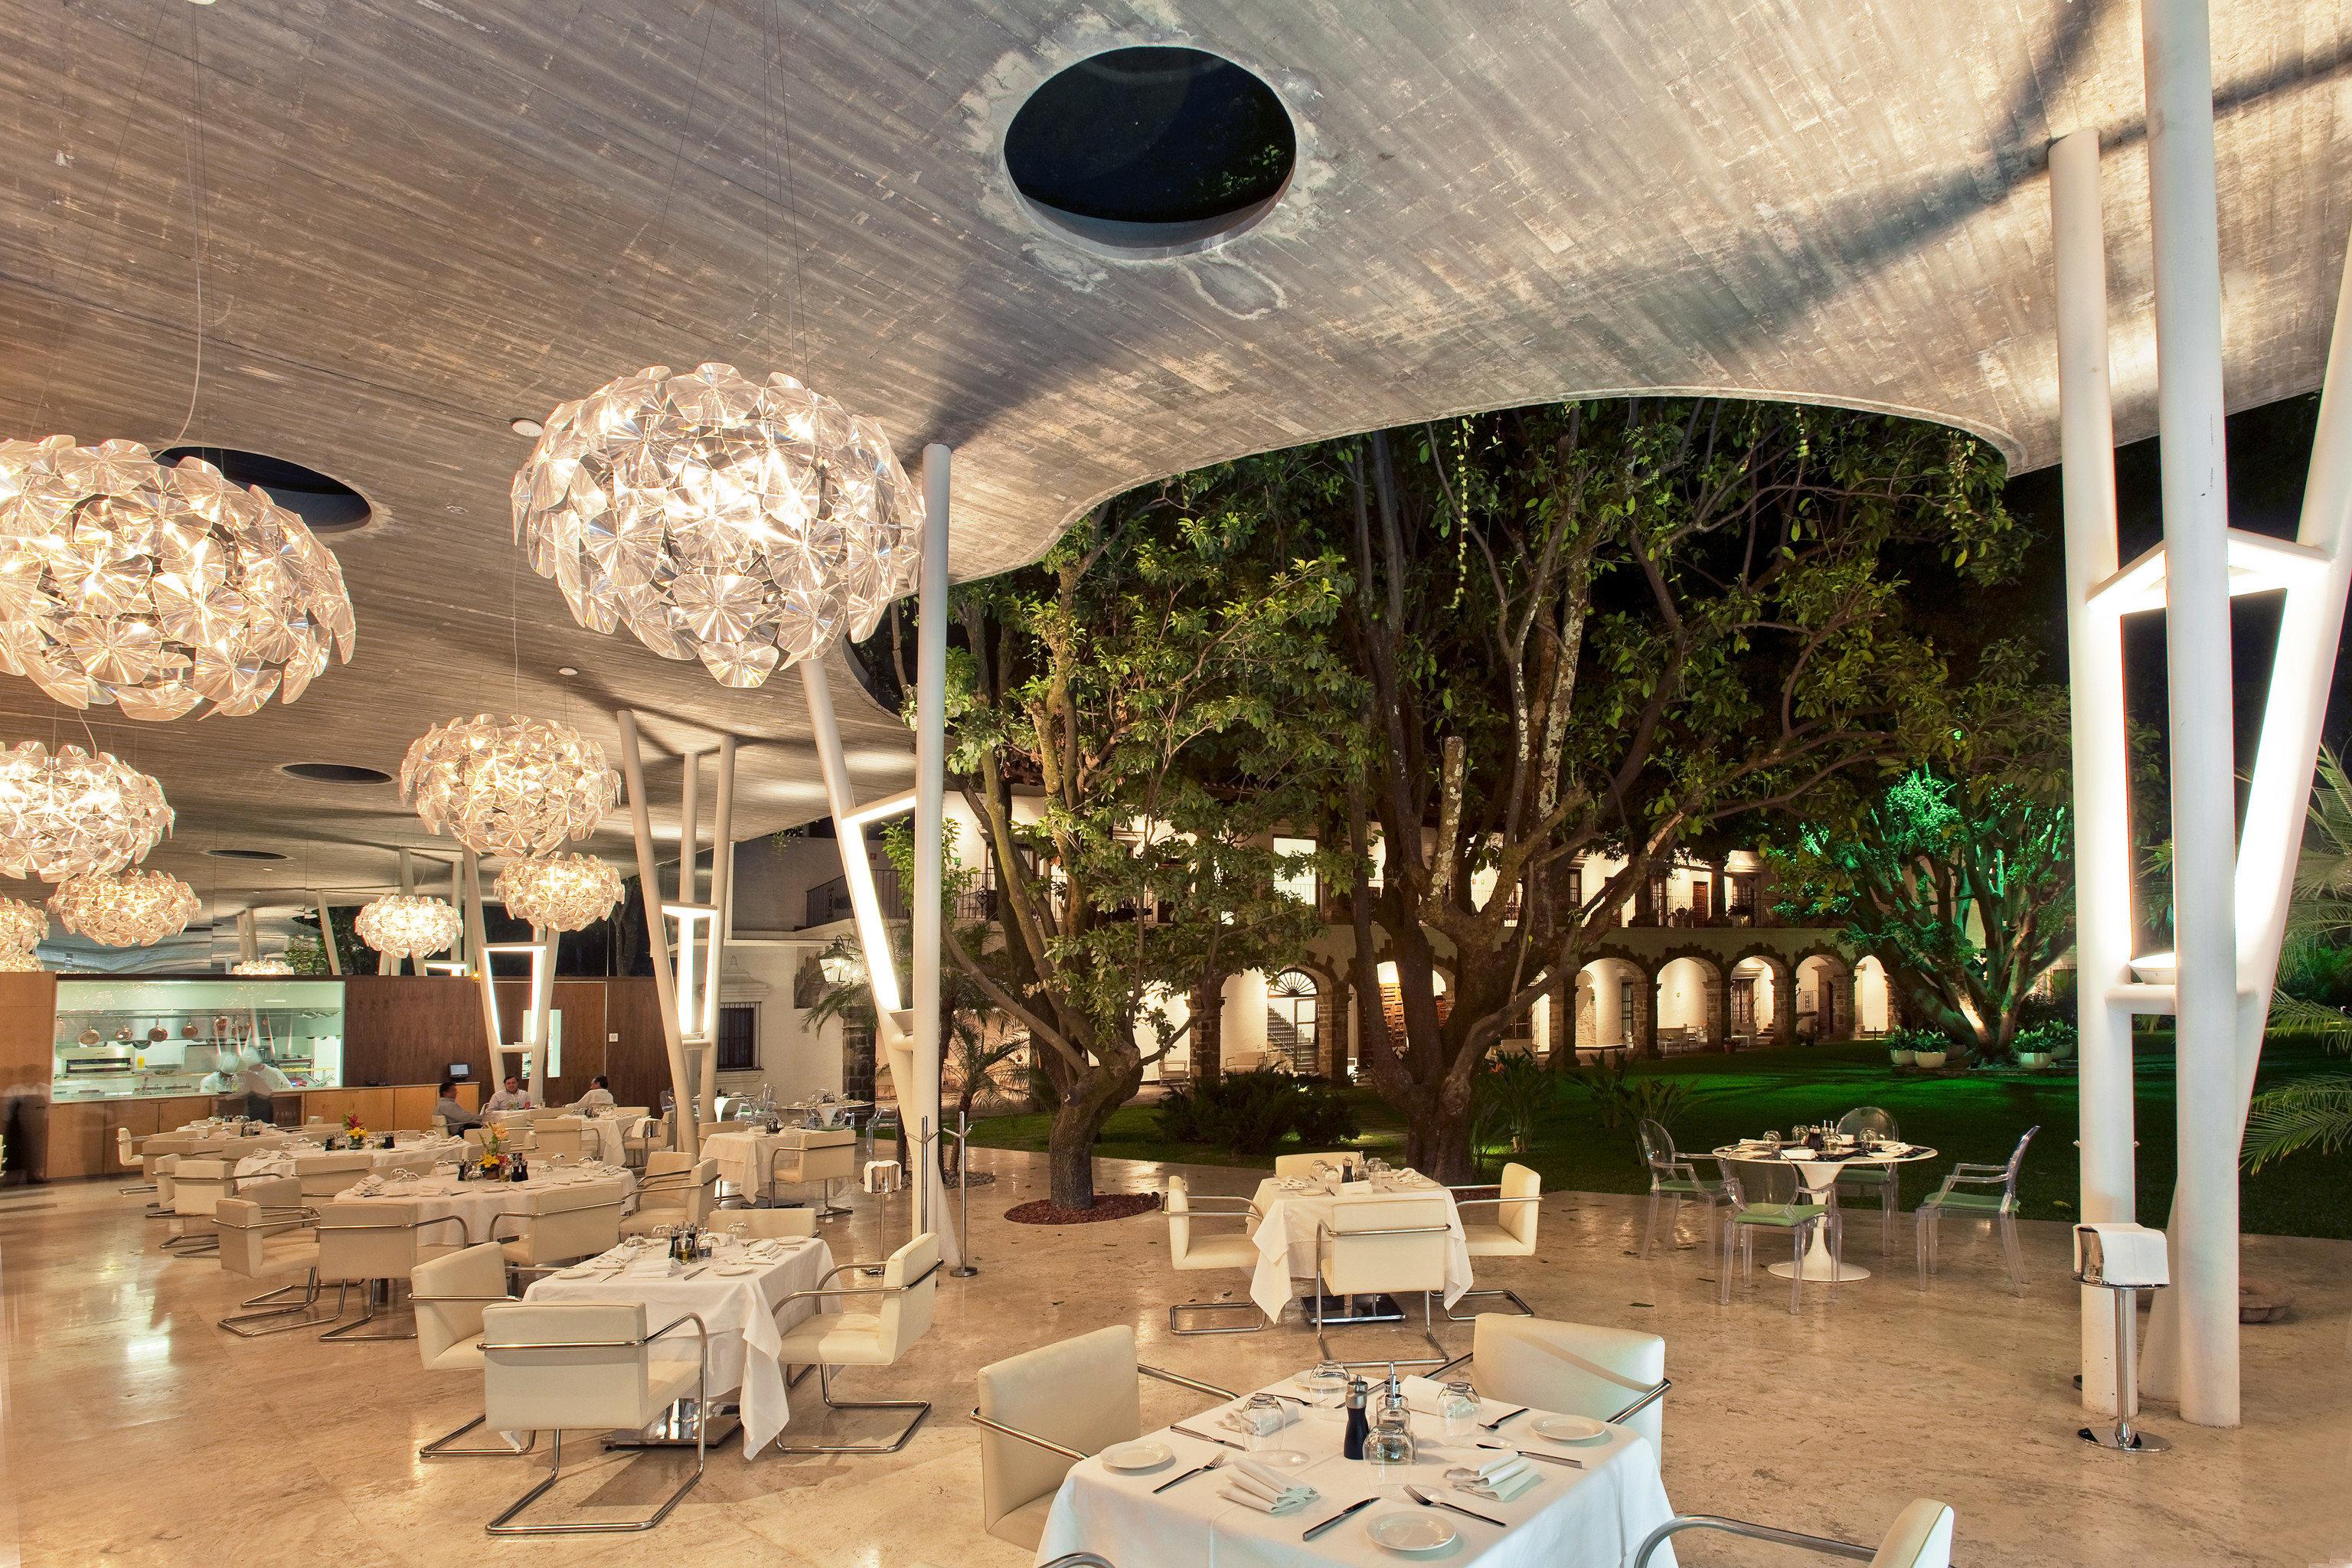 lighting Lobby Resort restaurant dining table